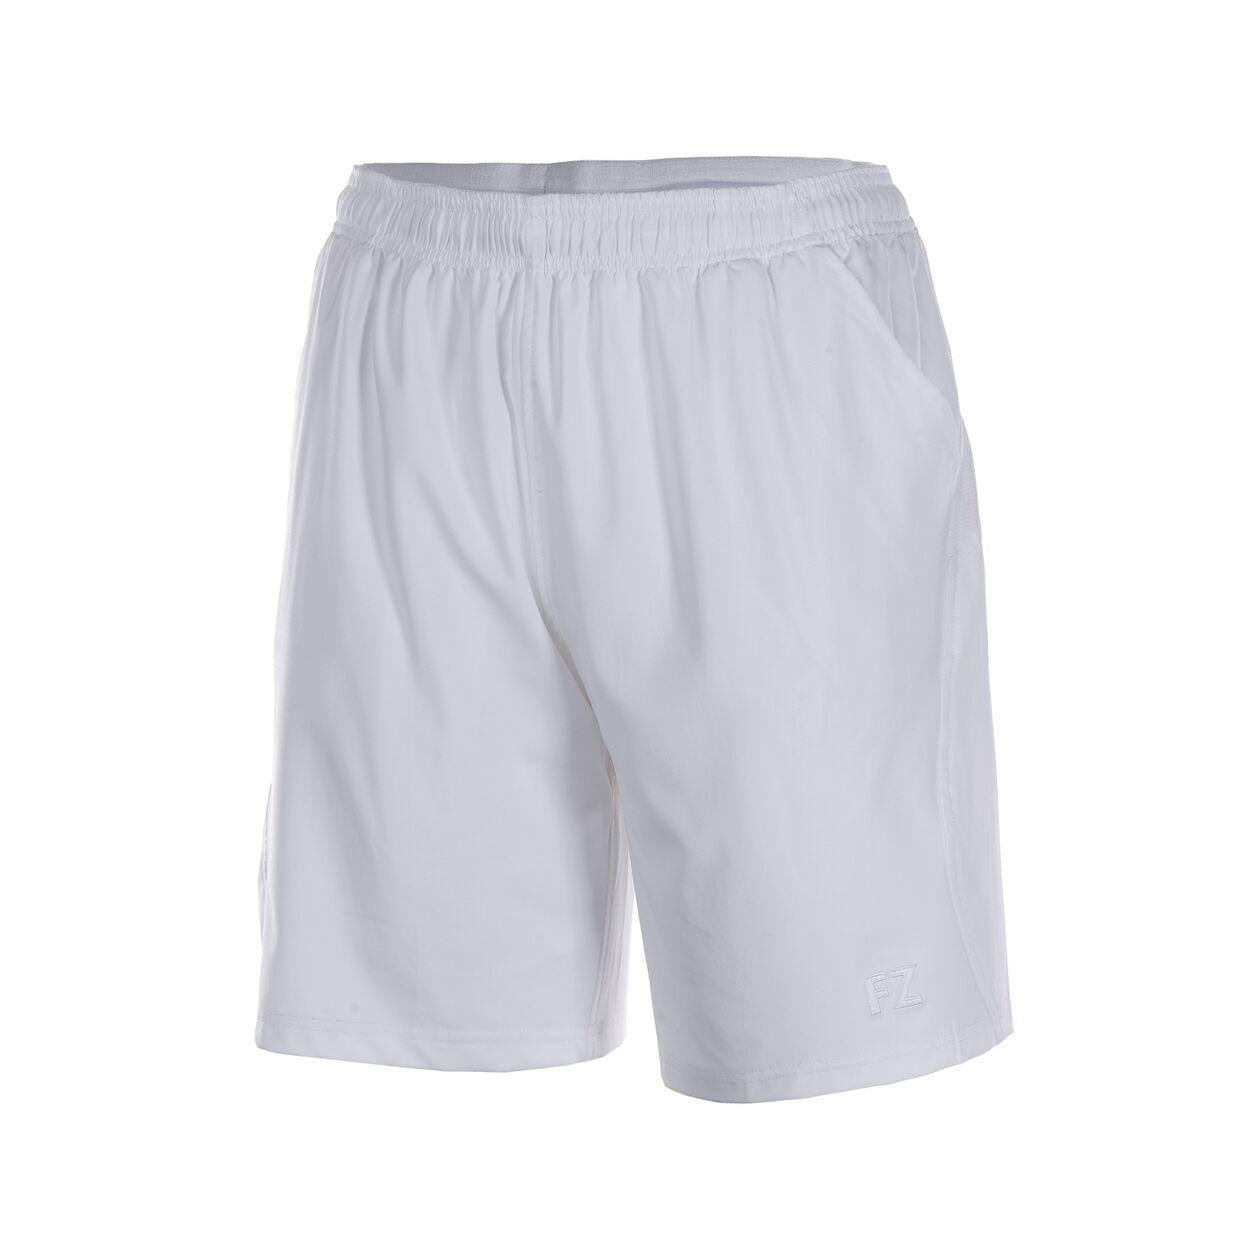 FZ Forza Ajax Shorts Men White S